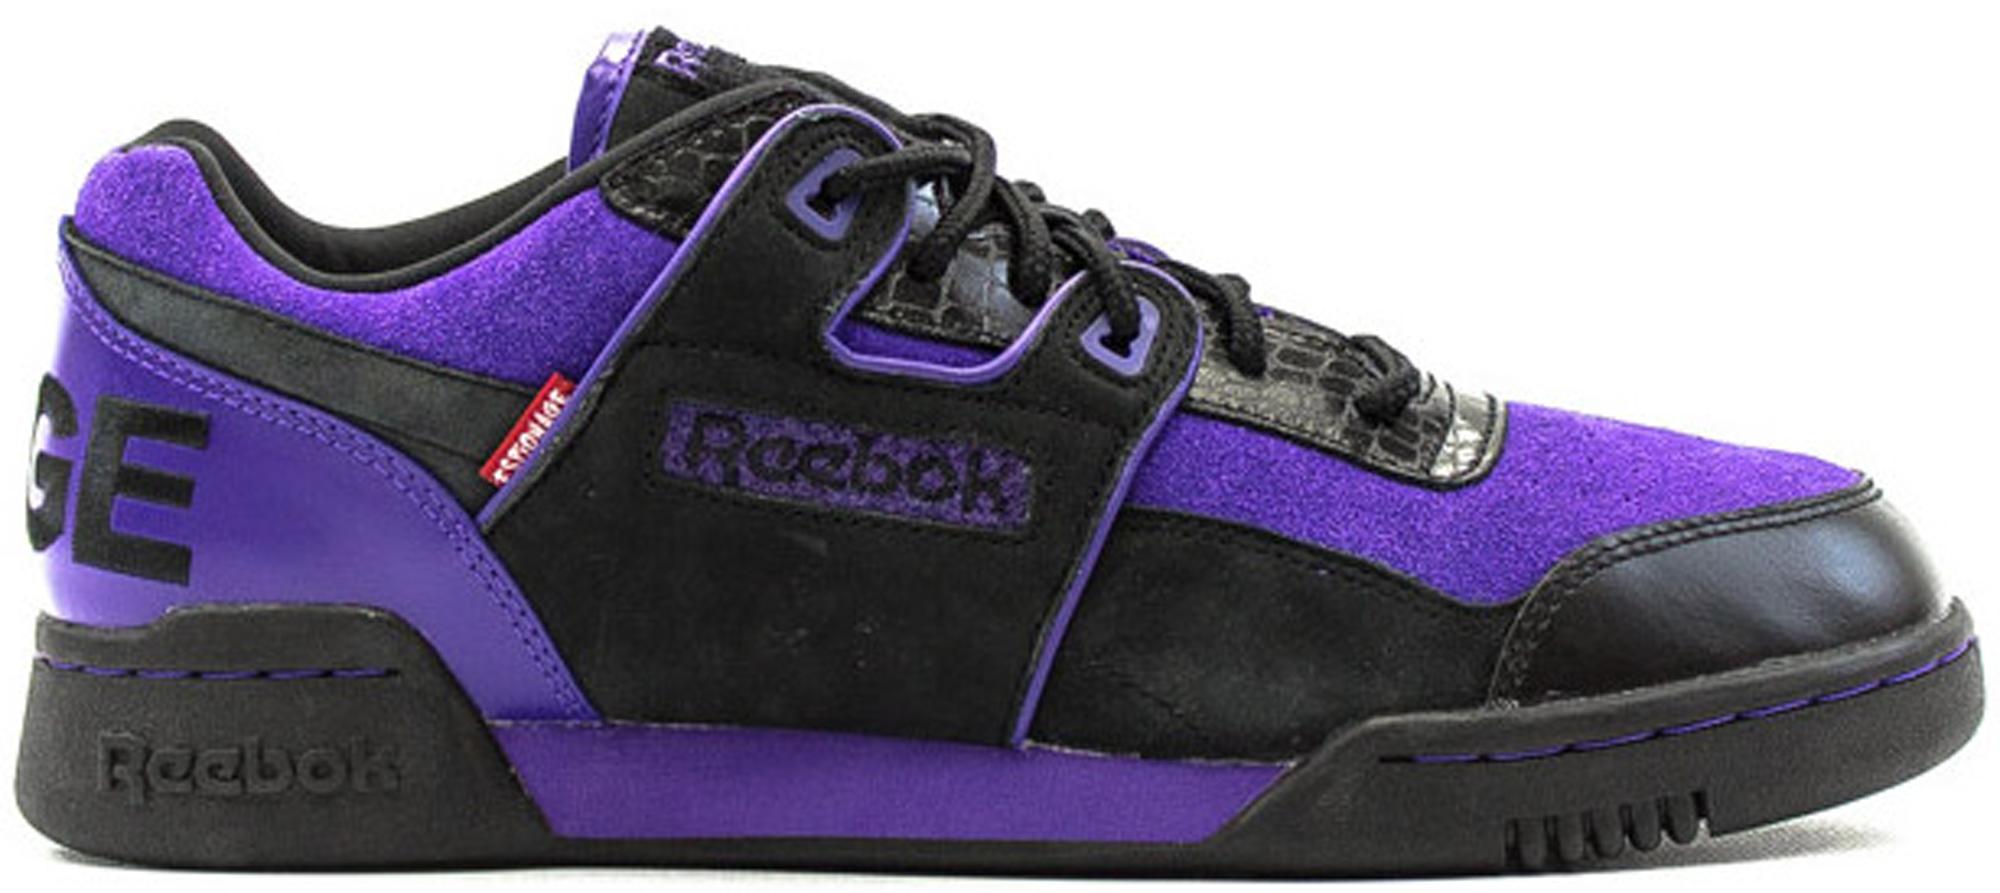 Reebok Workout Plus Espionage Purple Carrot